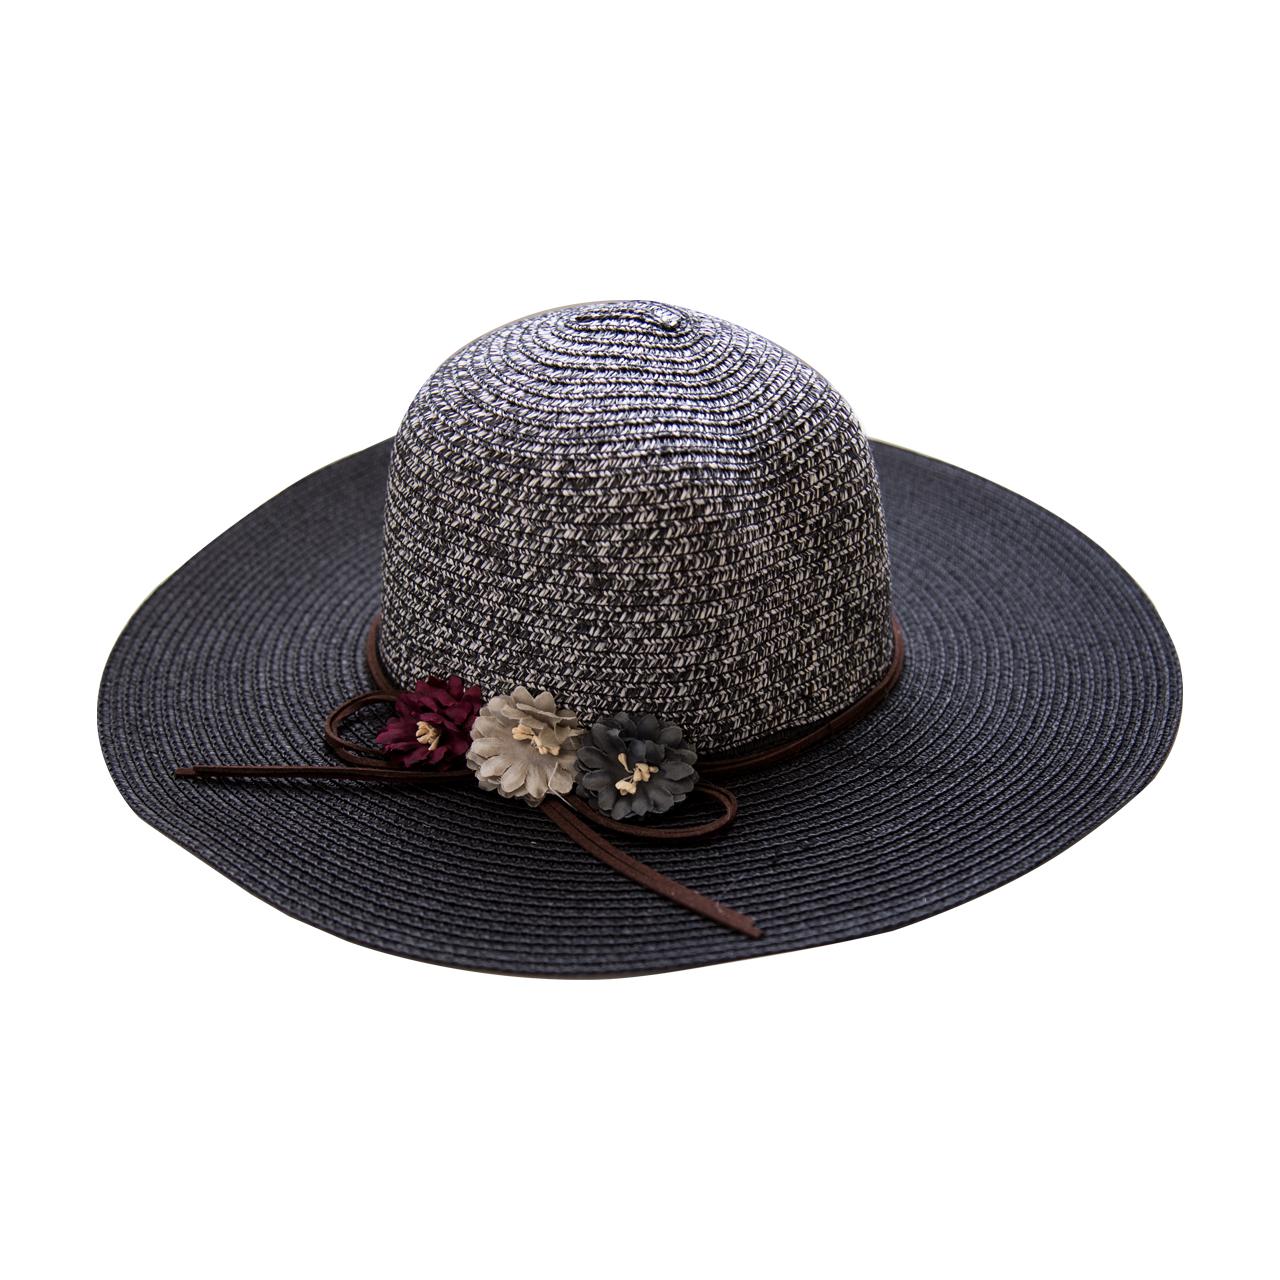 کلاه زنانه مدل BL-003